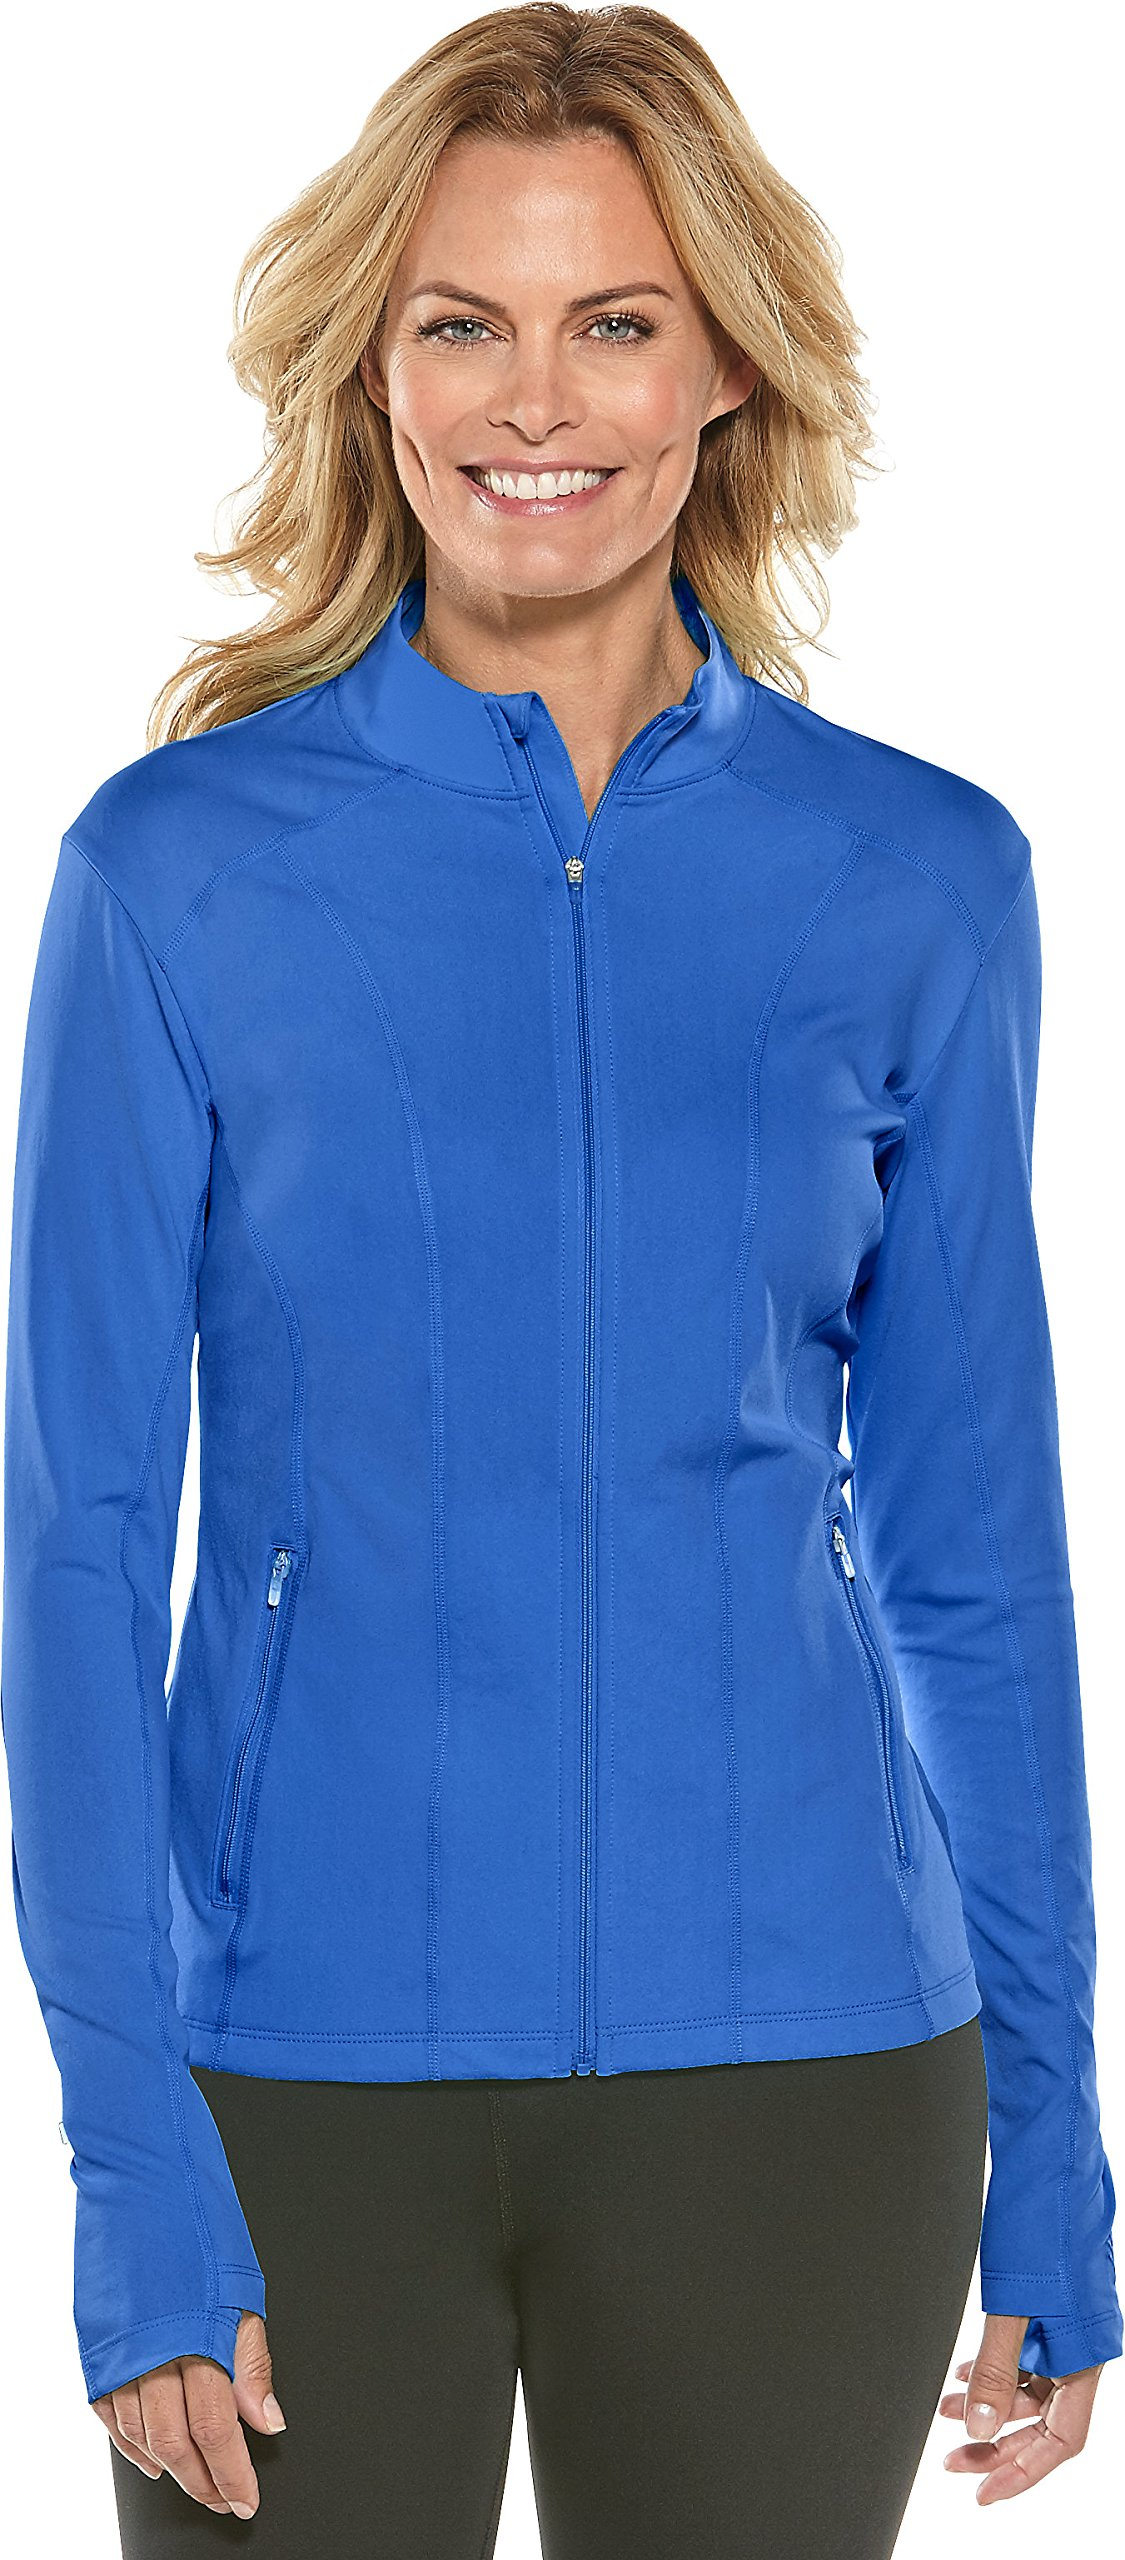 Coolibar UPF 50+ Women's Malawi Swim Jacket - Sun Protective (Large- Baja Blue) by Coolibar